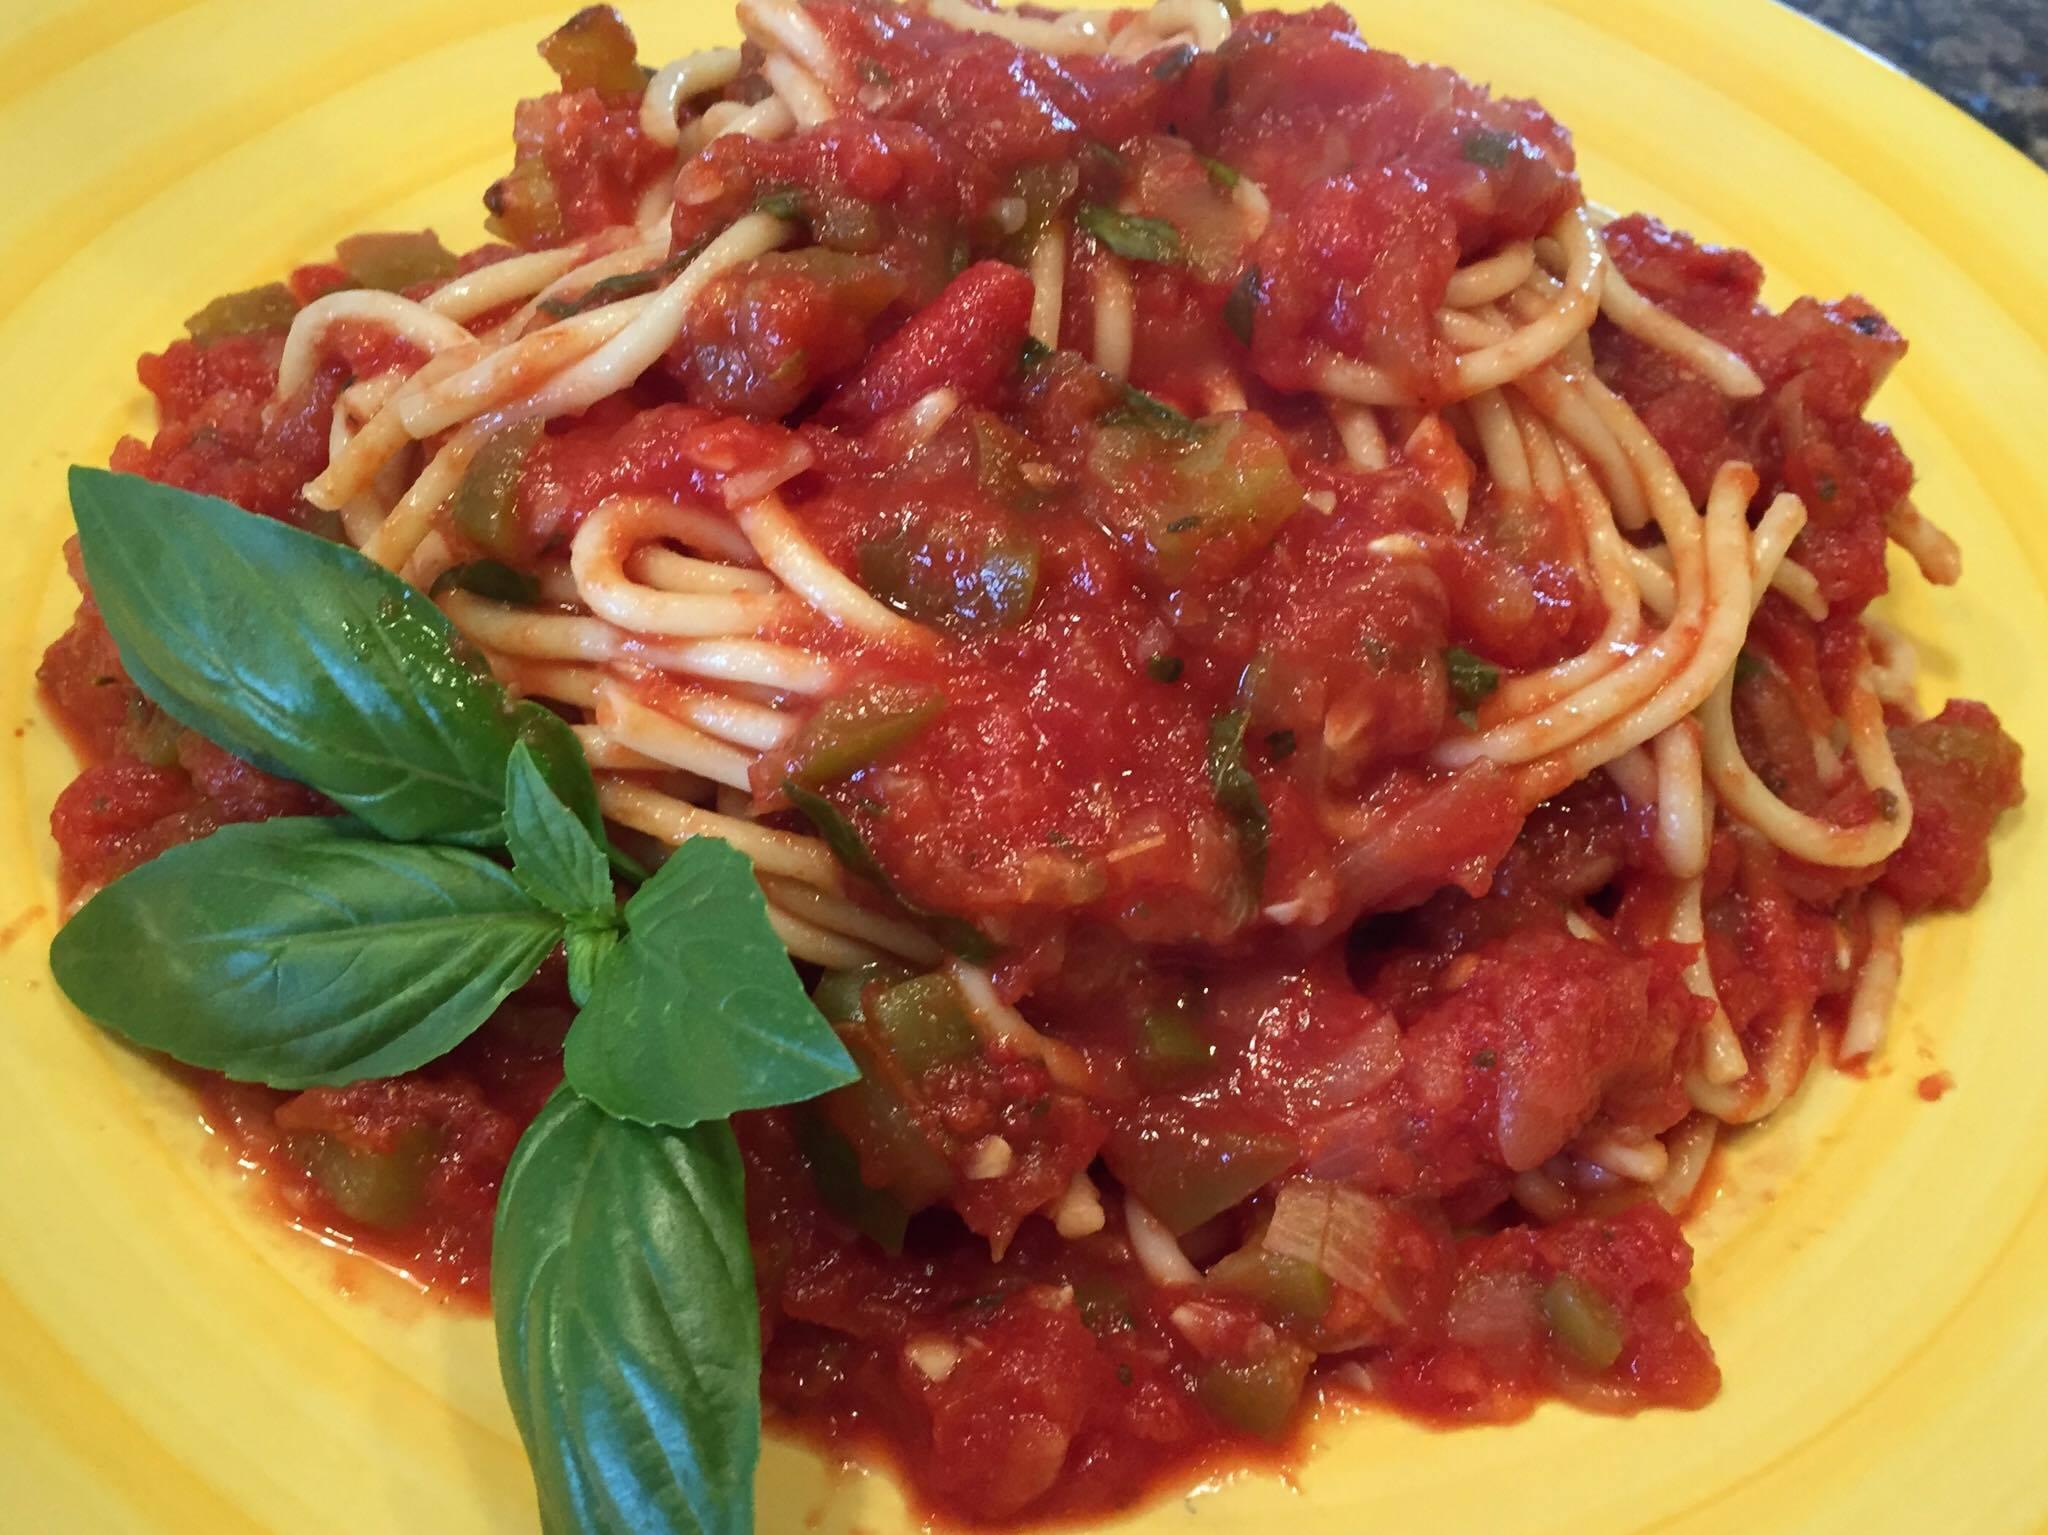 hearty-vegetable-vegan-spaghetti-sauce-topping